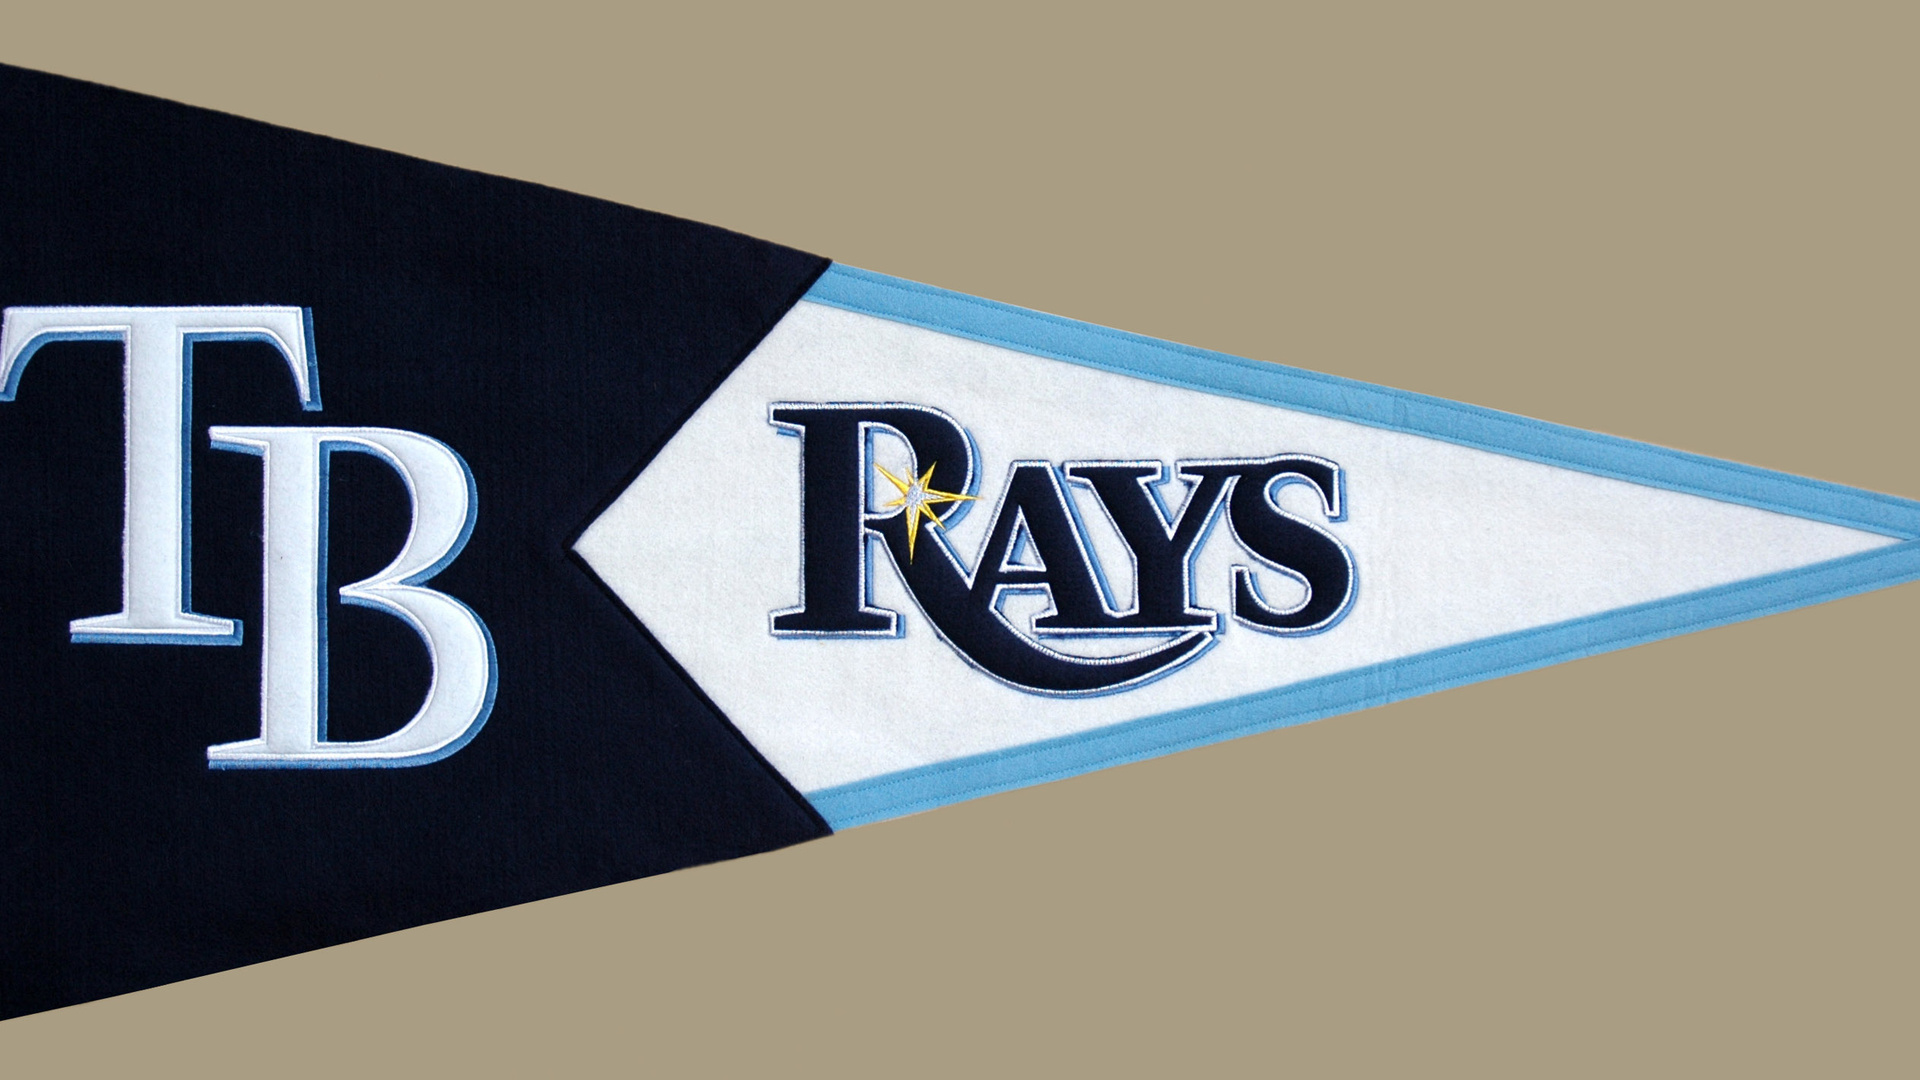 Tampa Bay Rays Photos